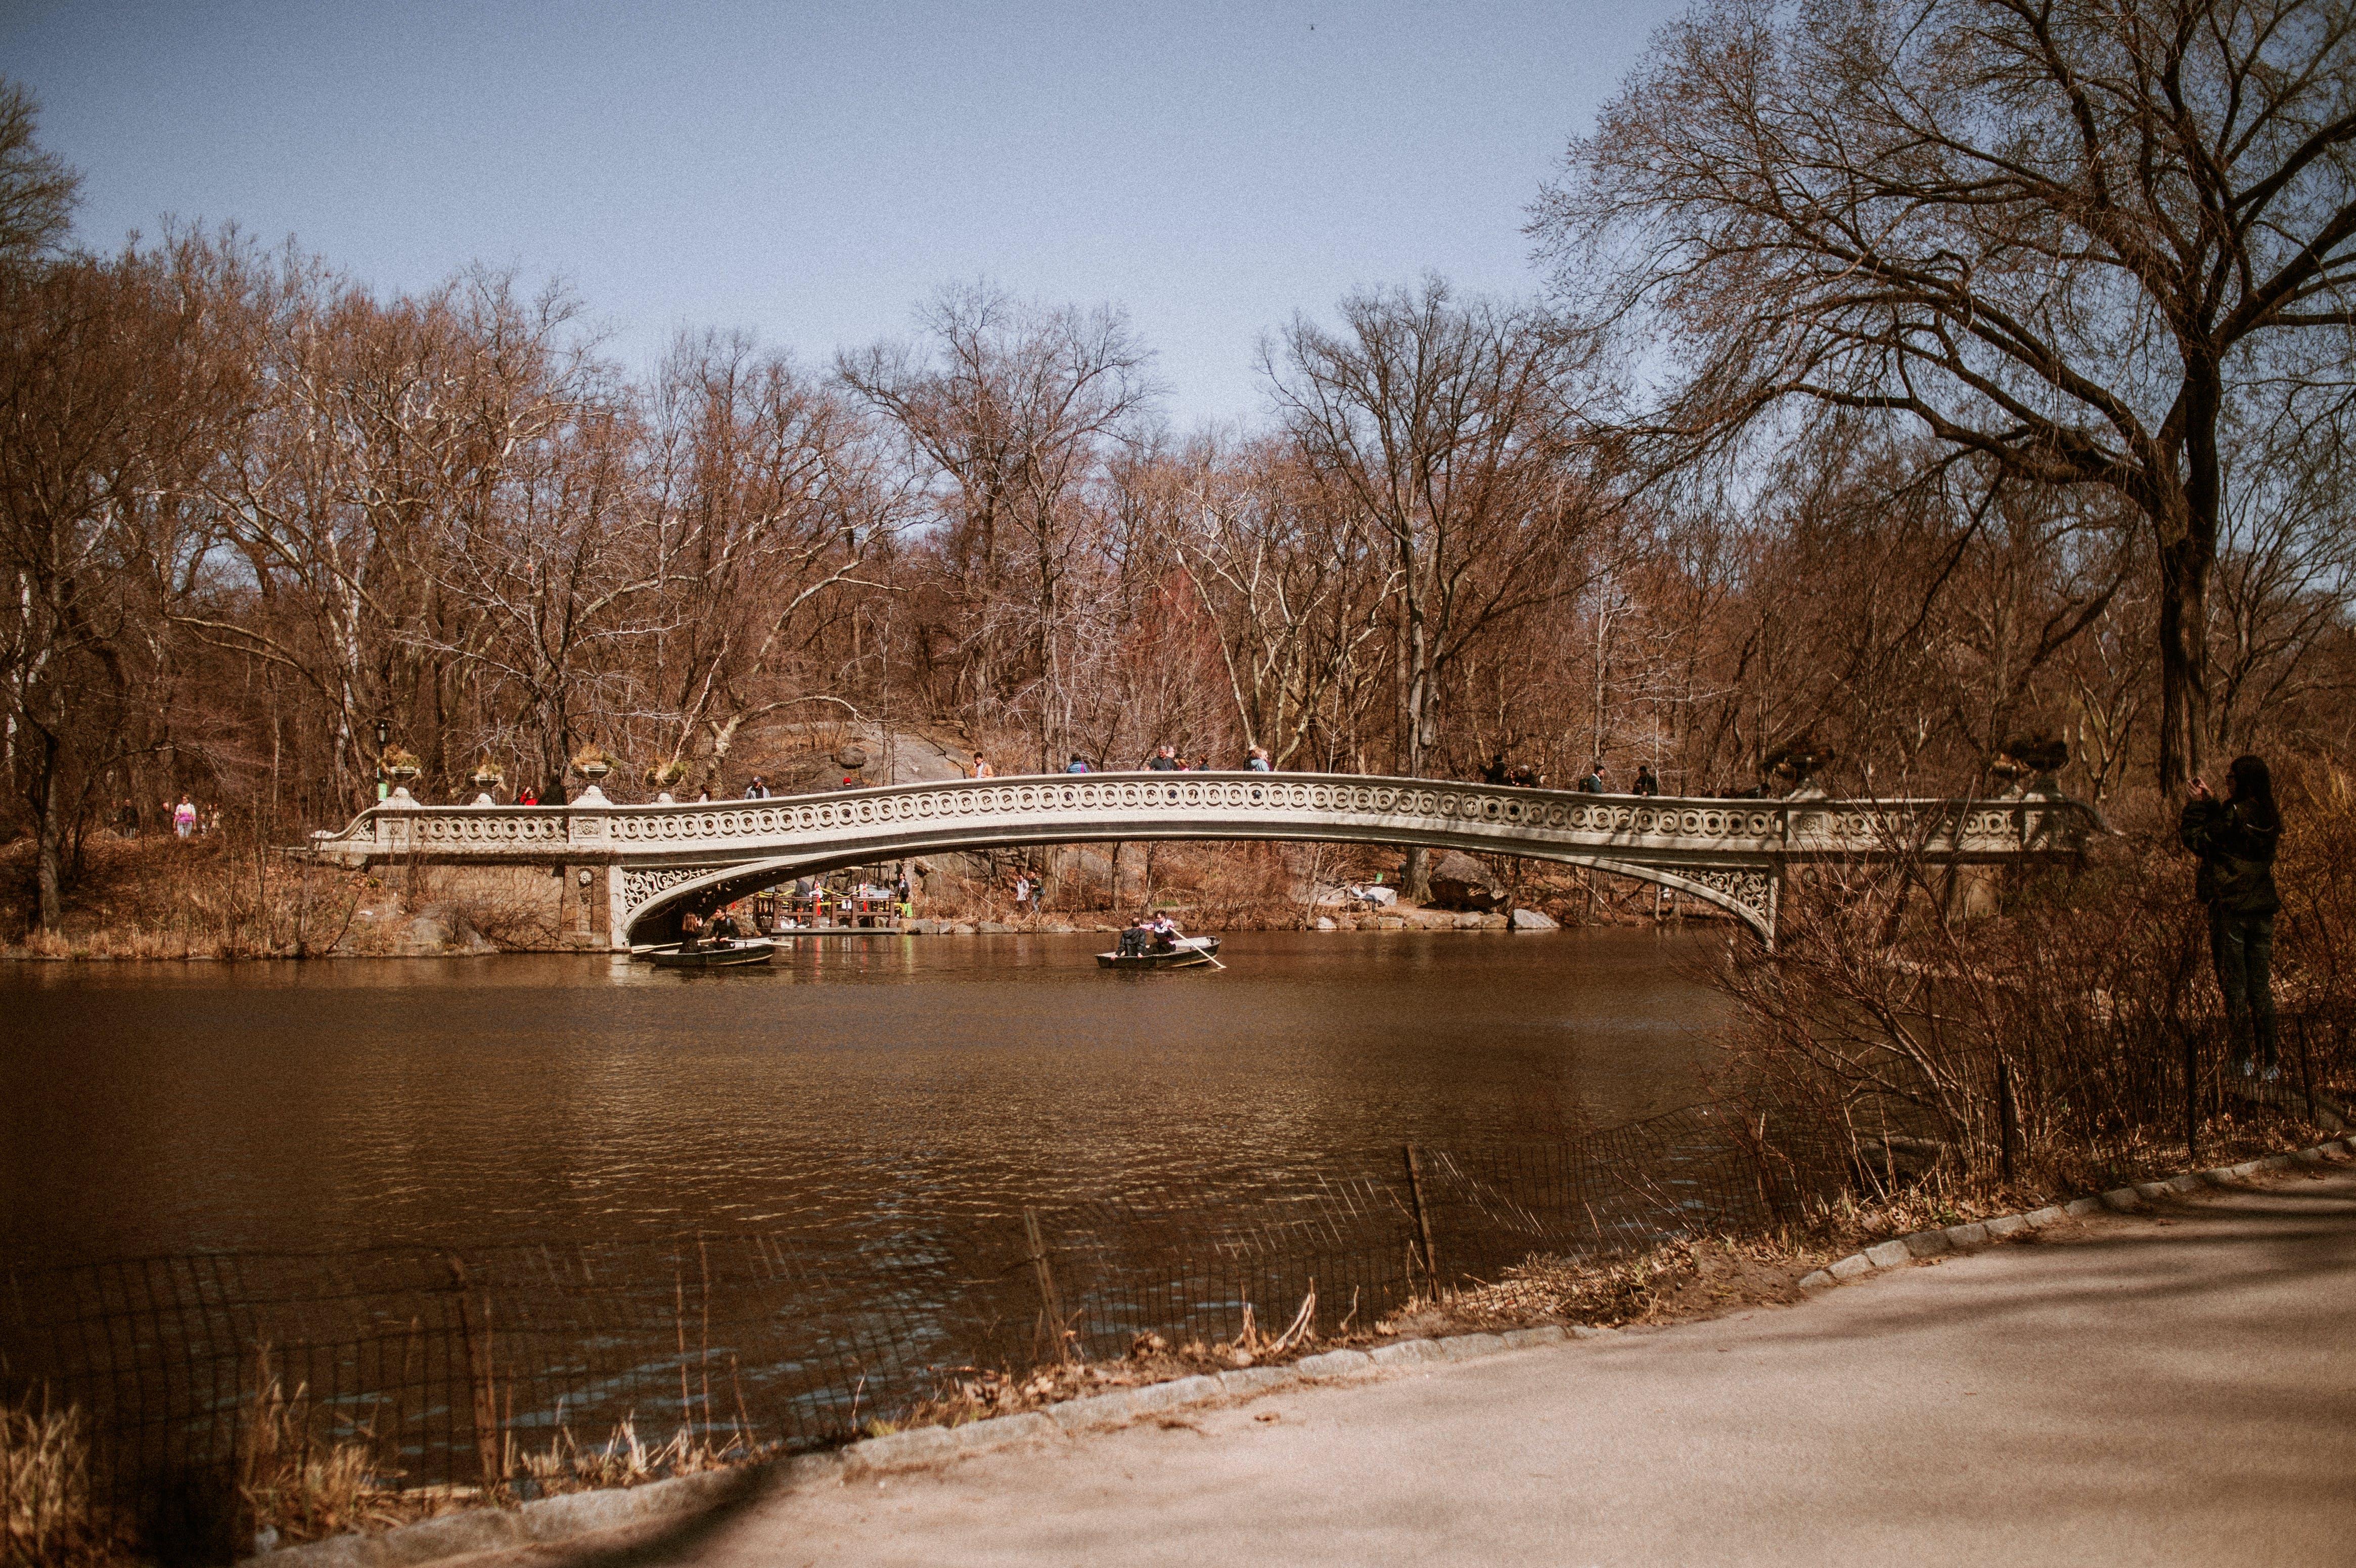 canoe passing under rhe Bridge